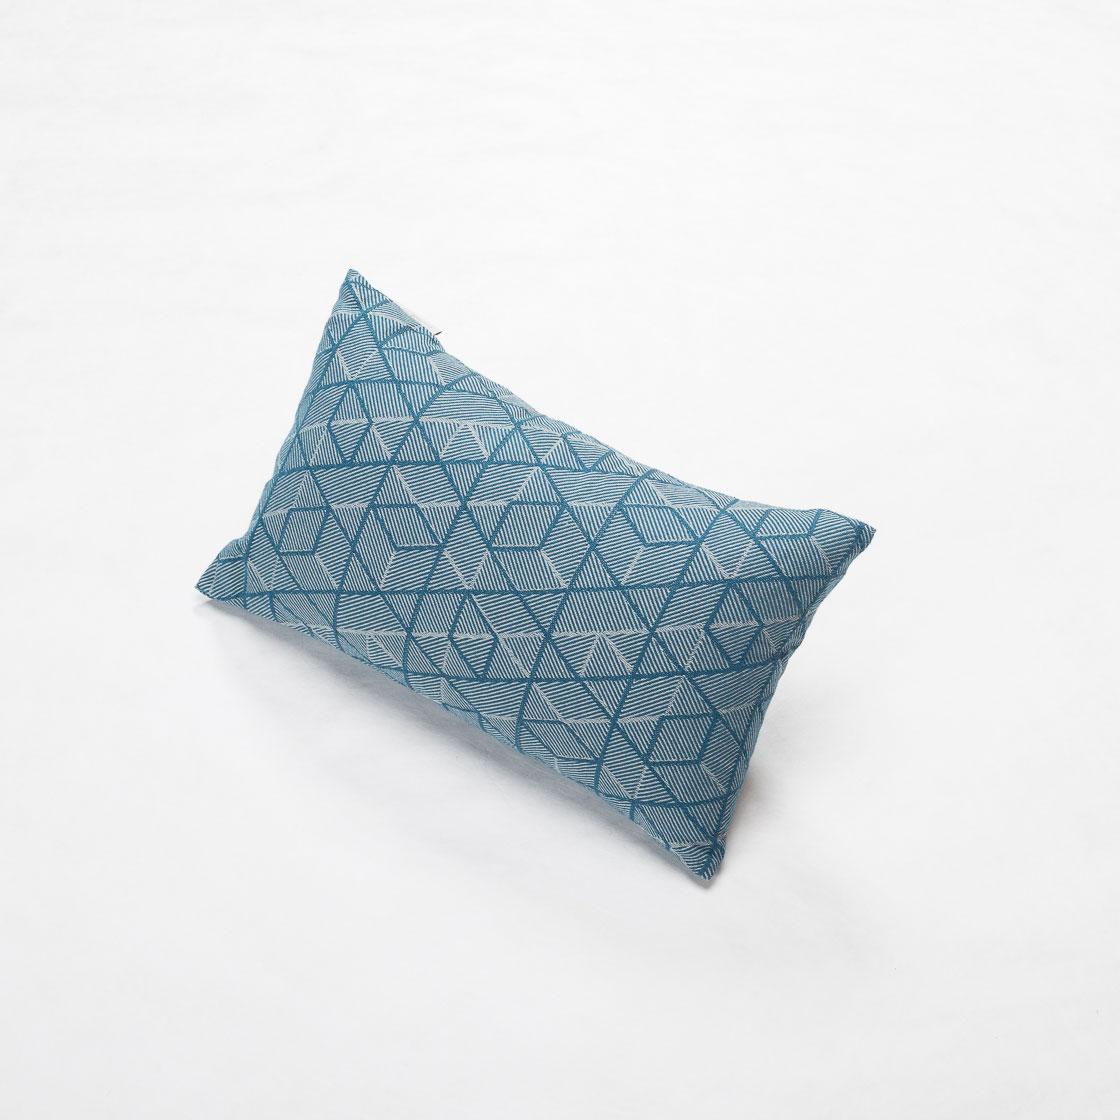 como kissenh lle grafik 30 x 50cm von david fussenegger. Black Bedroom Furniture Sets. Home Design Ideas